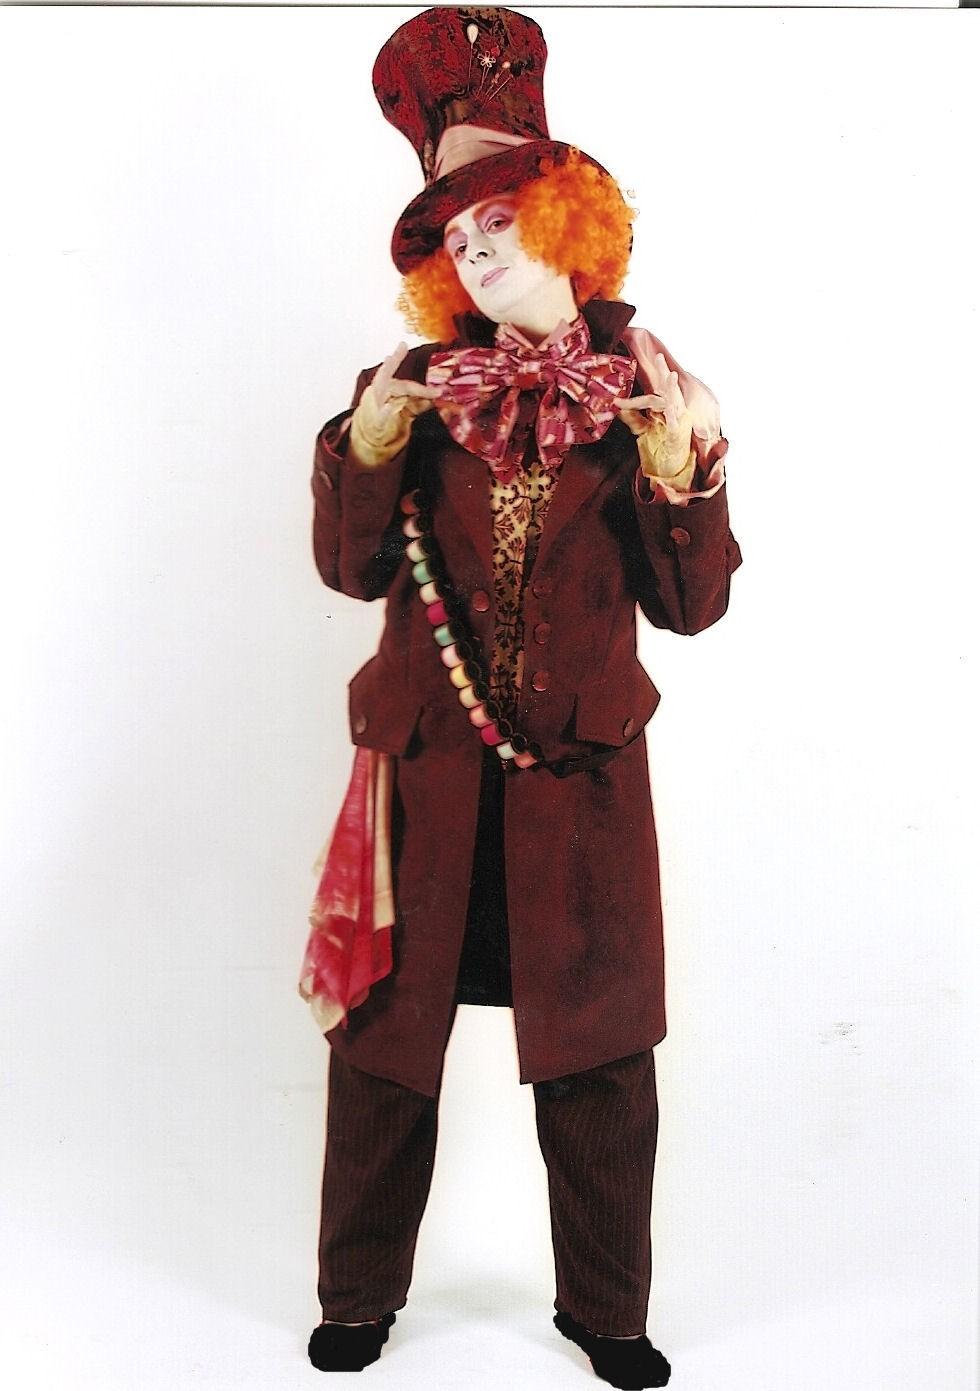 Tim Burton Mad Hatter Costume Hire   Supazaar   980 x 1391 jpeg 159kB